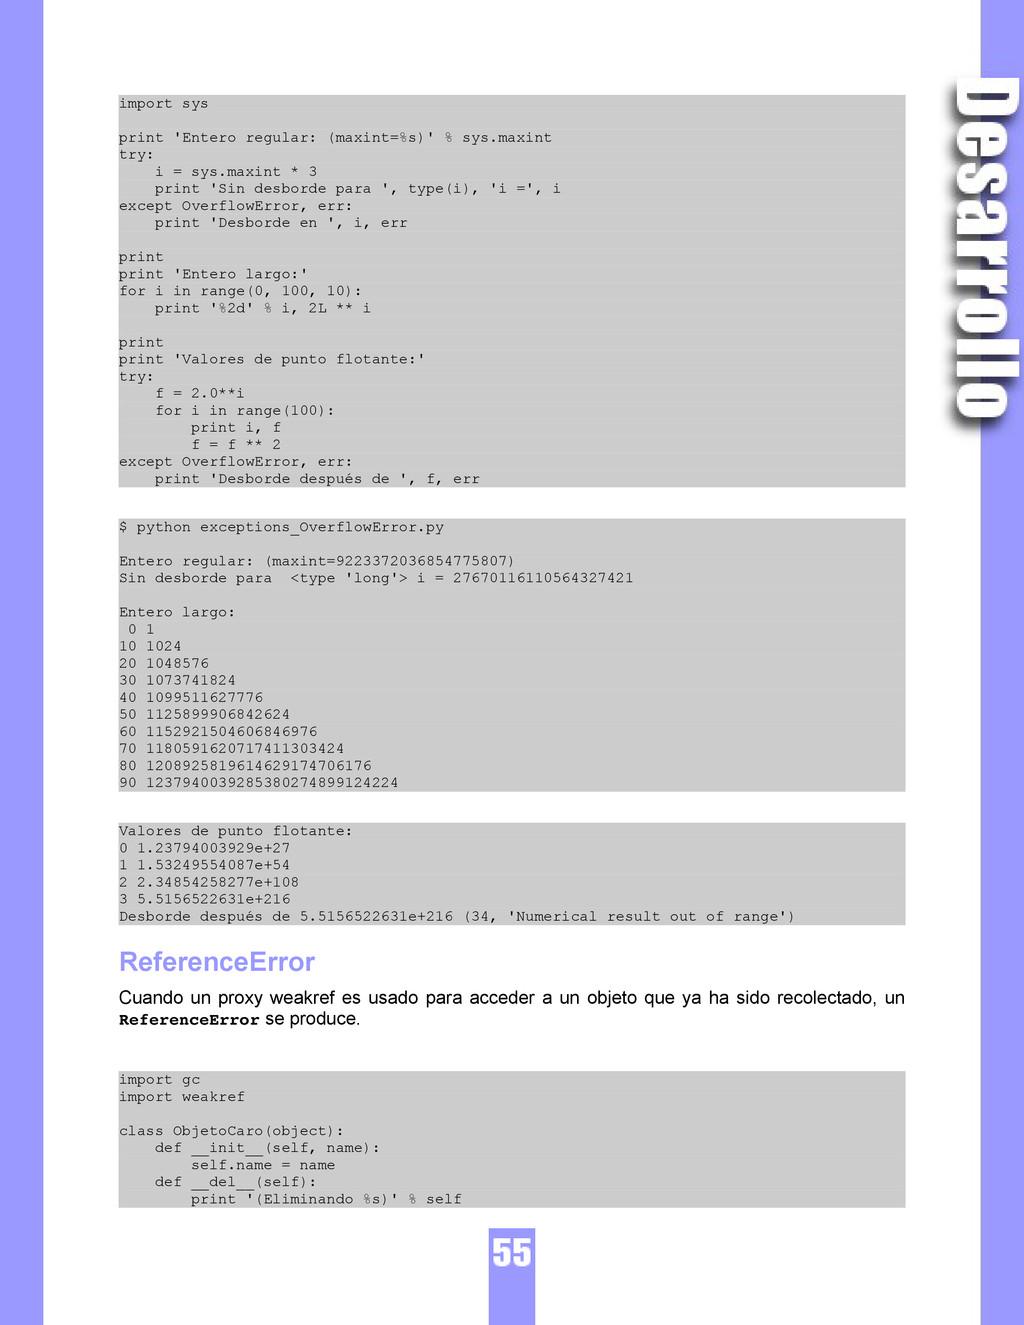 import sys print 'Entero regular: (maxint=%s)' ...